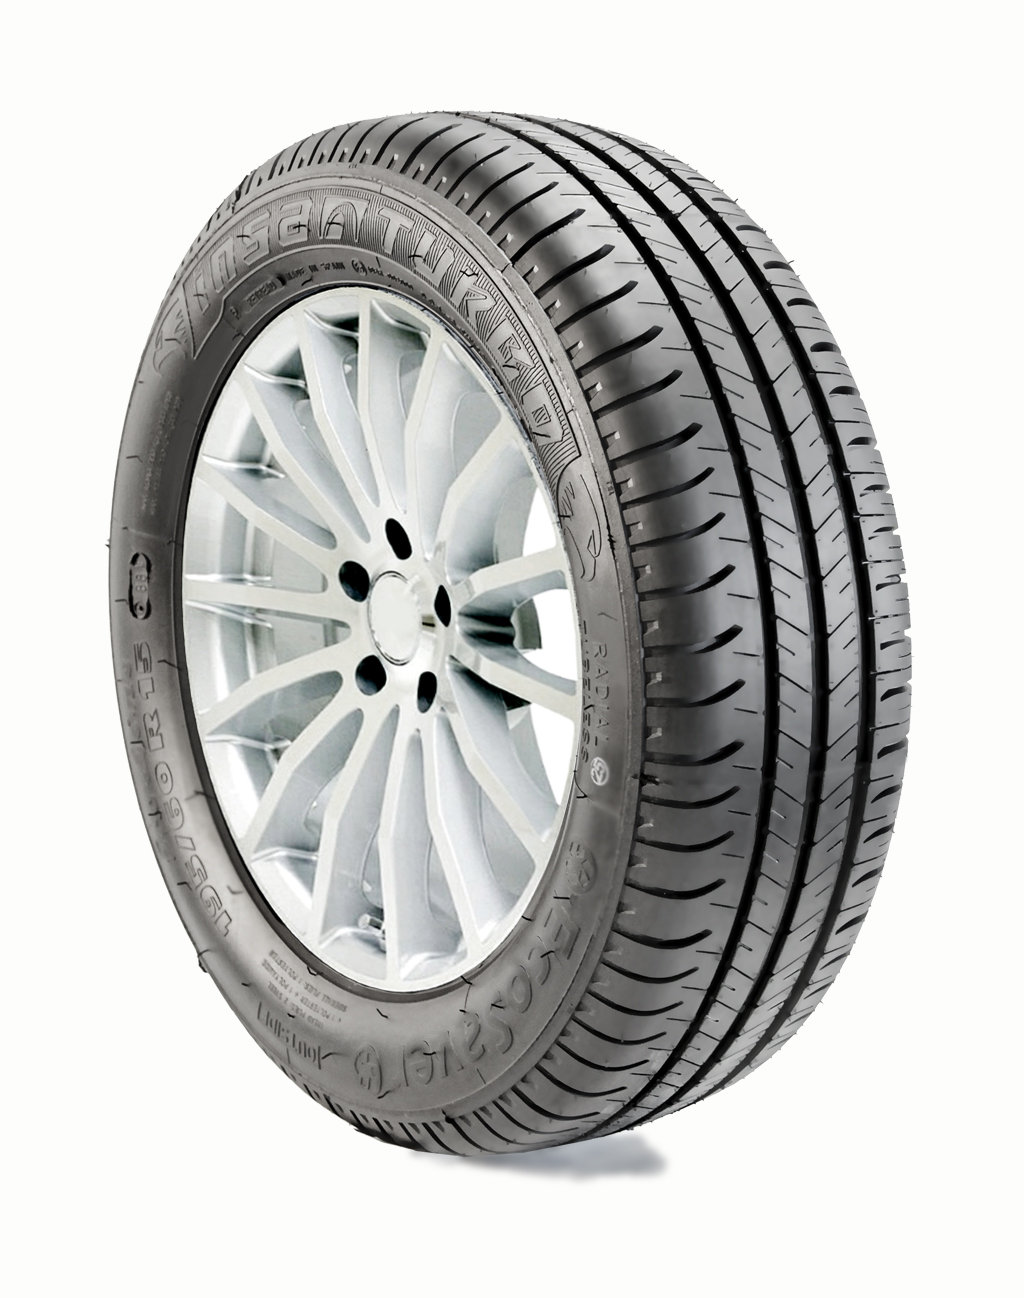 Neumático INSA TURBO ECOSAVER PLUS* 195/50R15 82 V